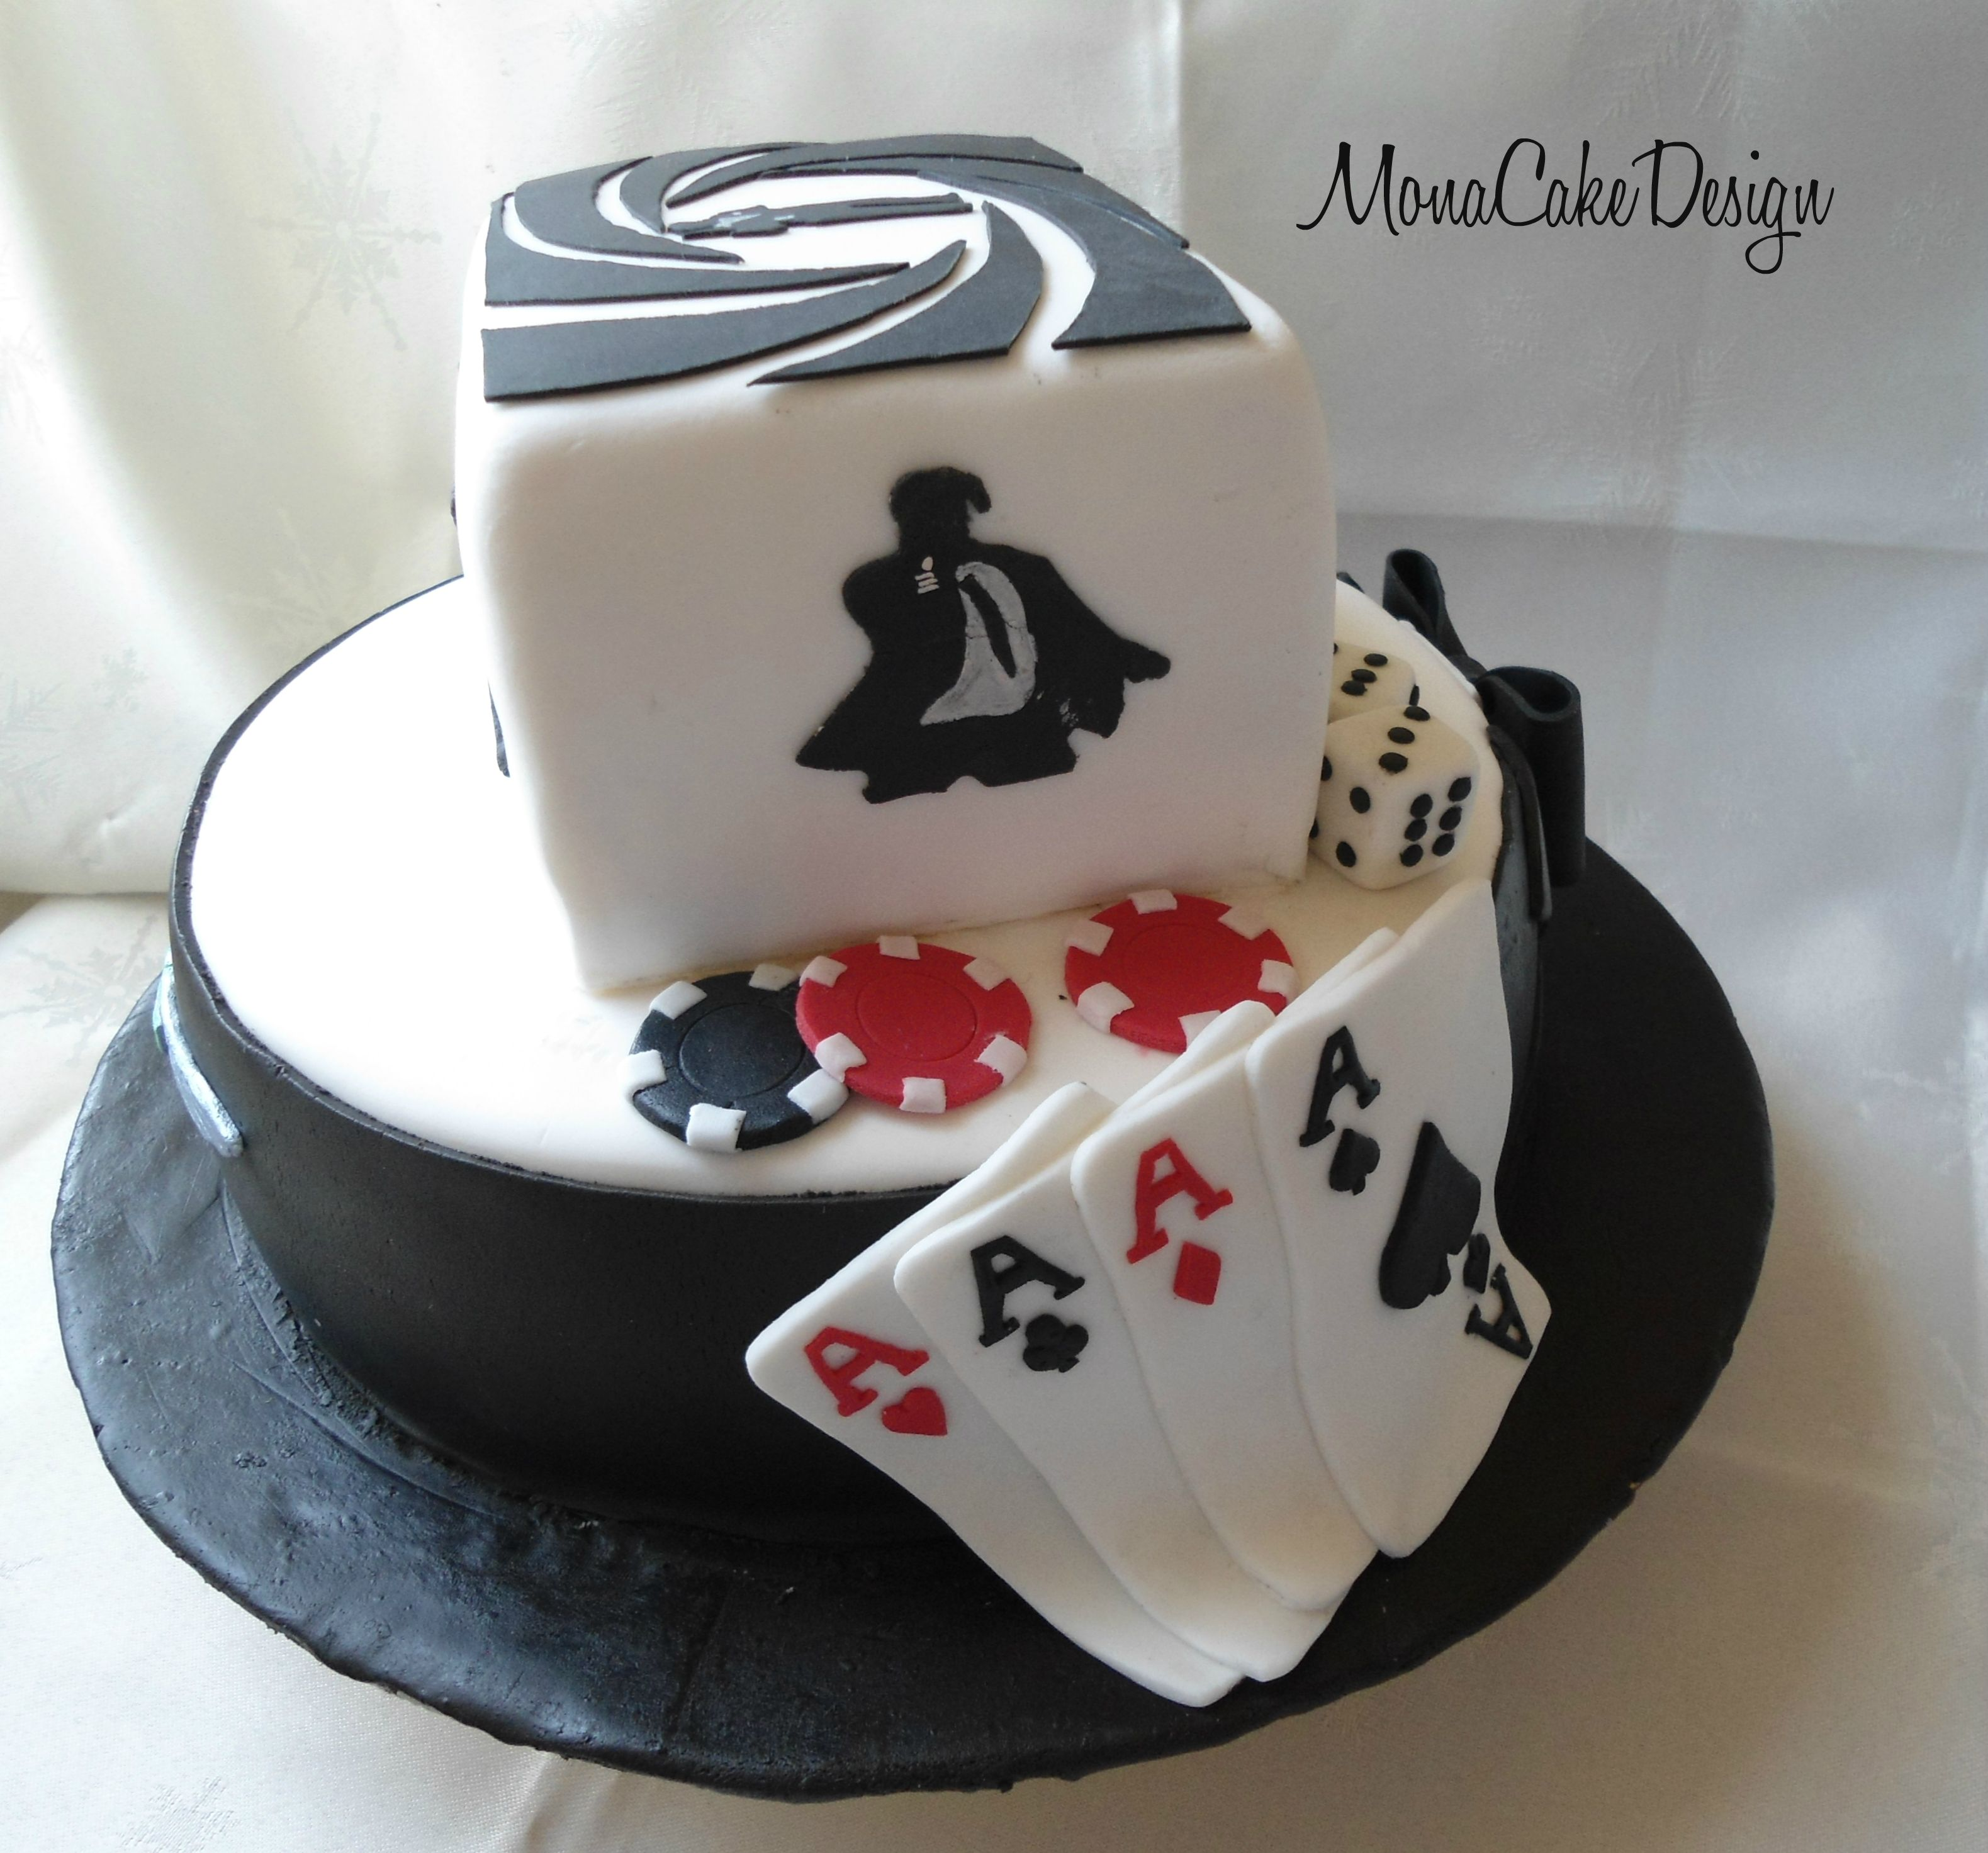 Cake Design James Bond : James Bond Cake MonaCakeDesign Pinterest